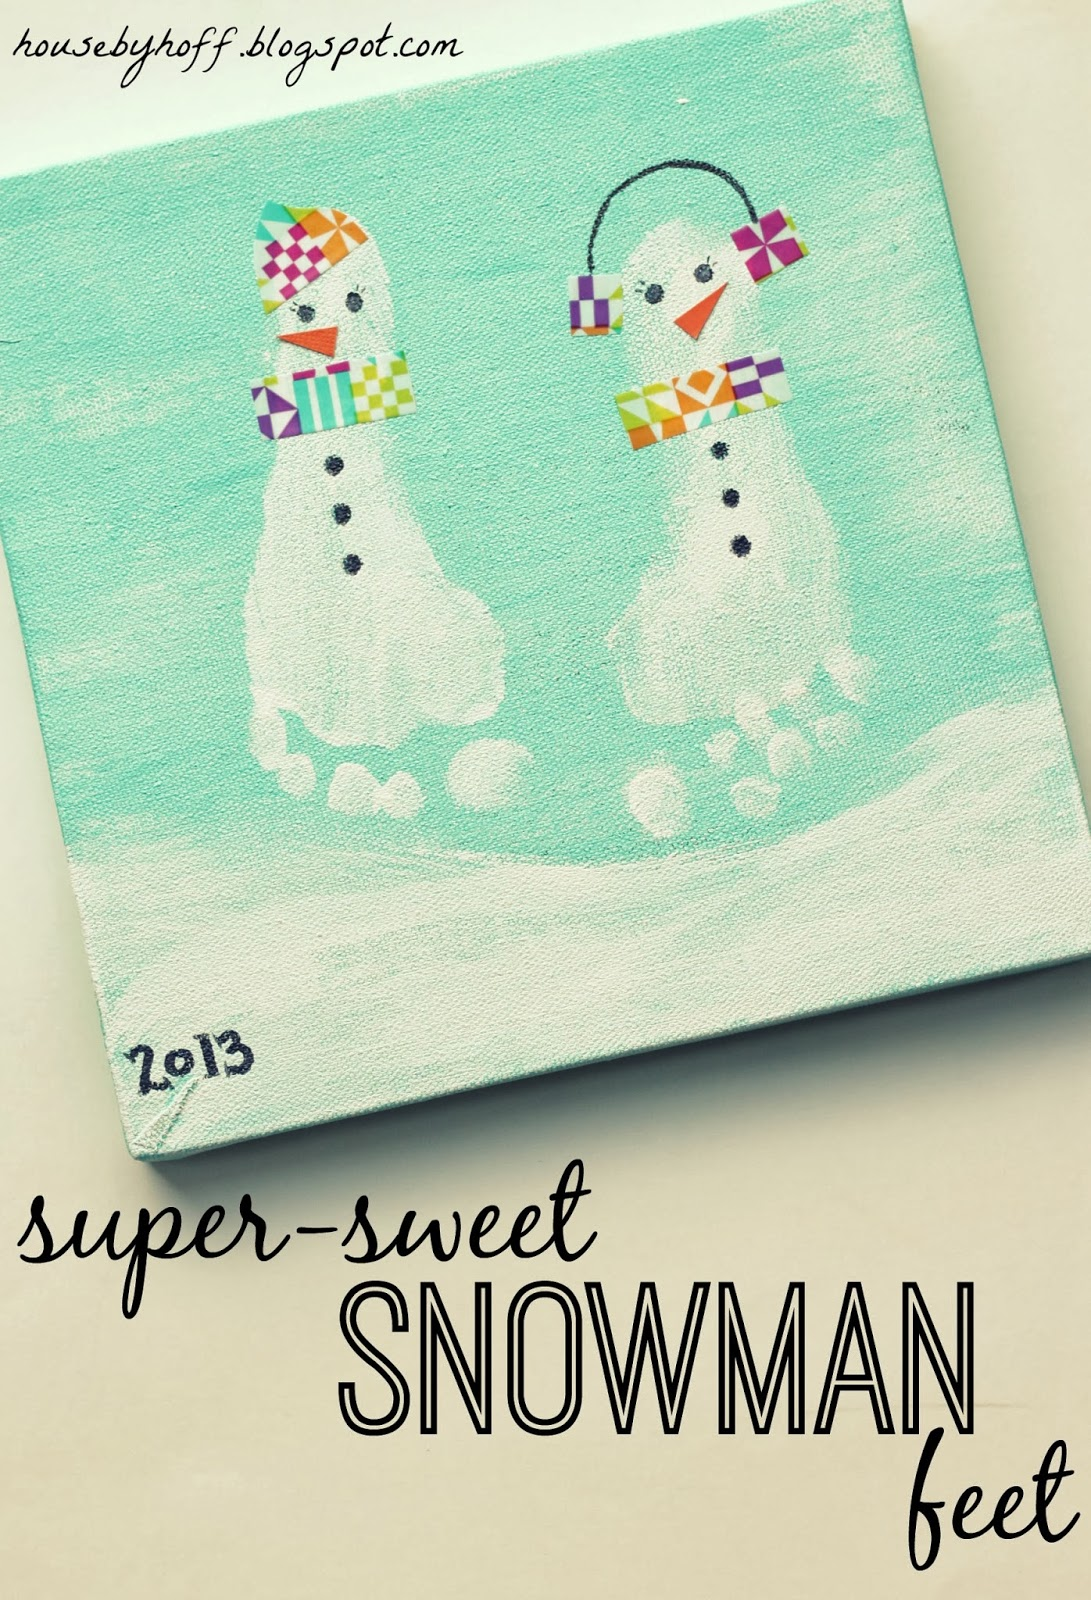 Super Sweet Snowman Feet House By Hoff